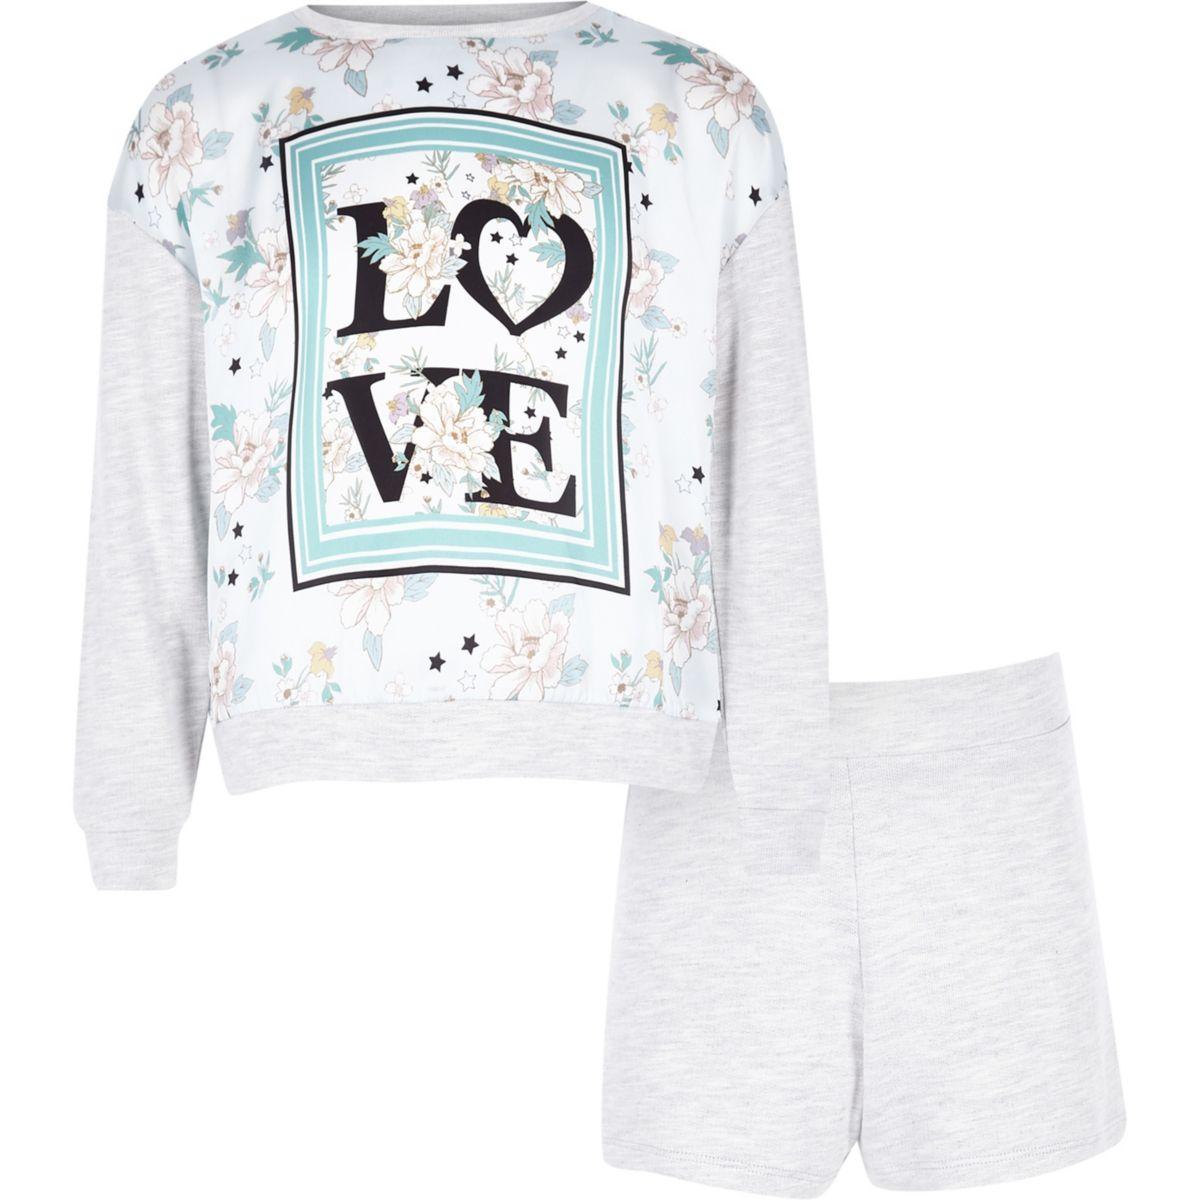 Girls grey 'love' panel print pyjama set